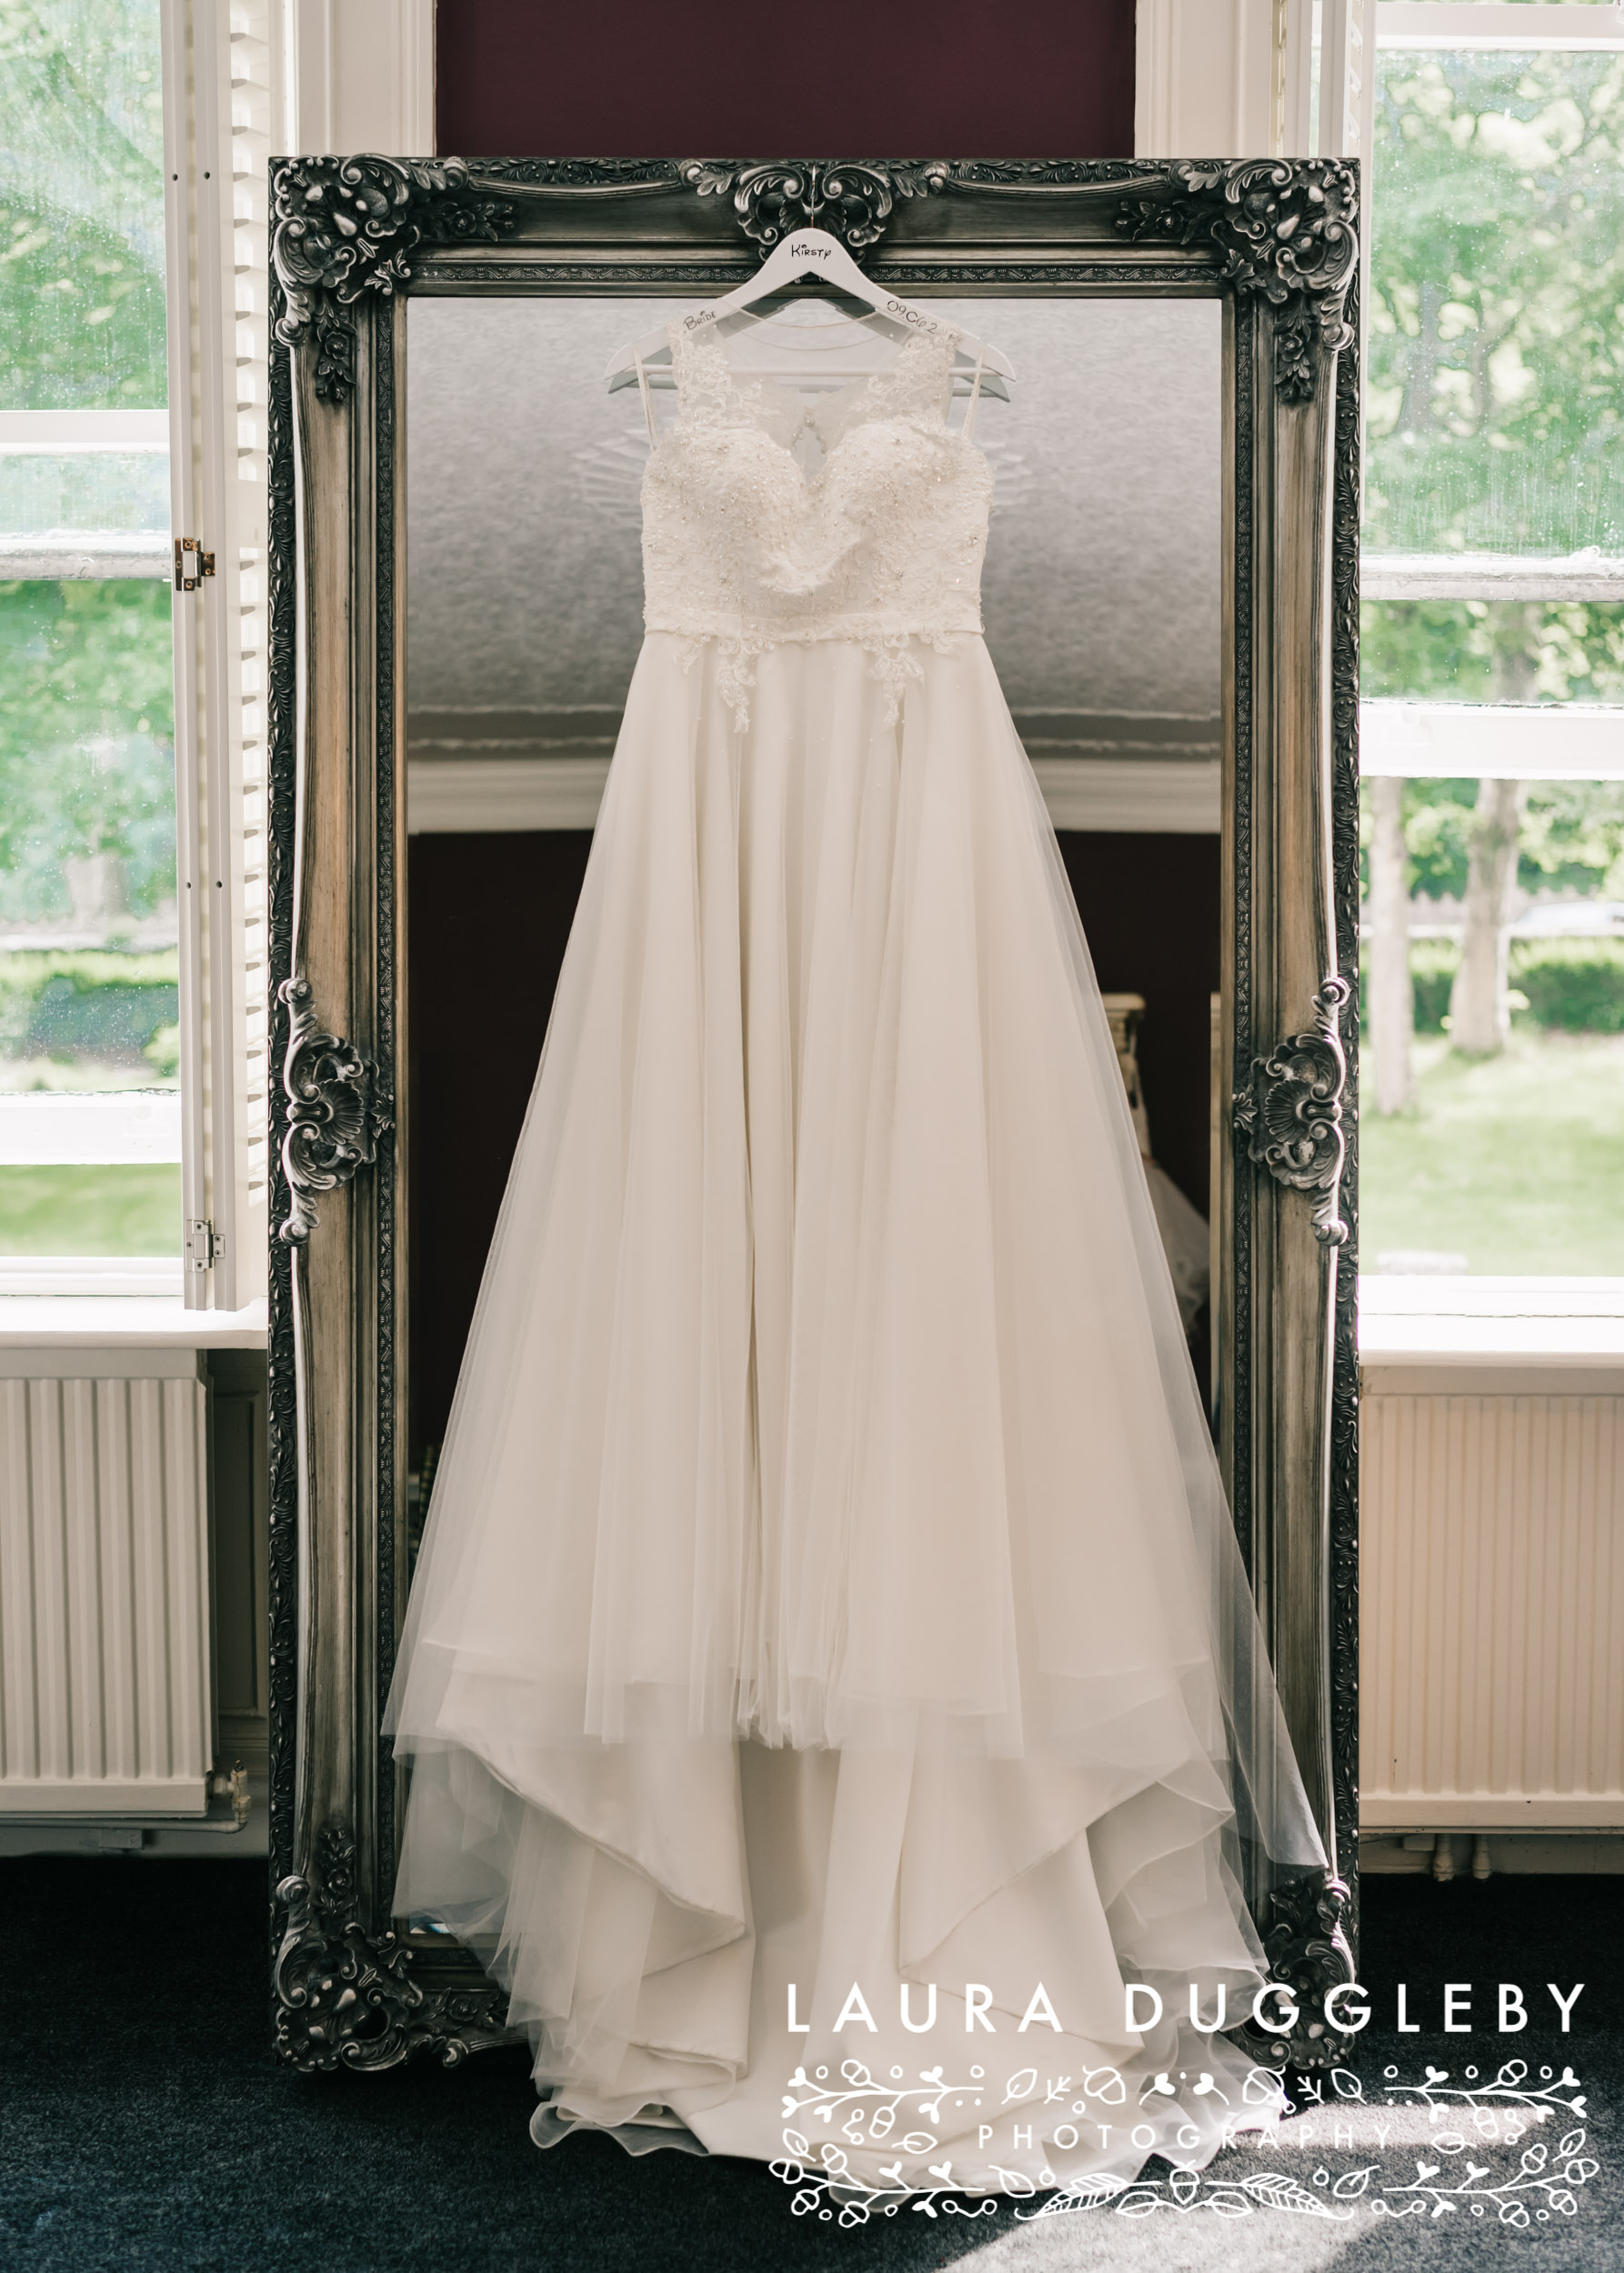 Sparth House Wedding - Lancashire Wedding Photographer2